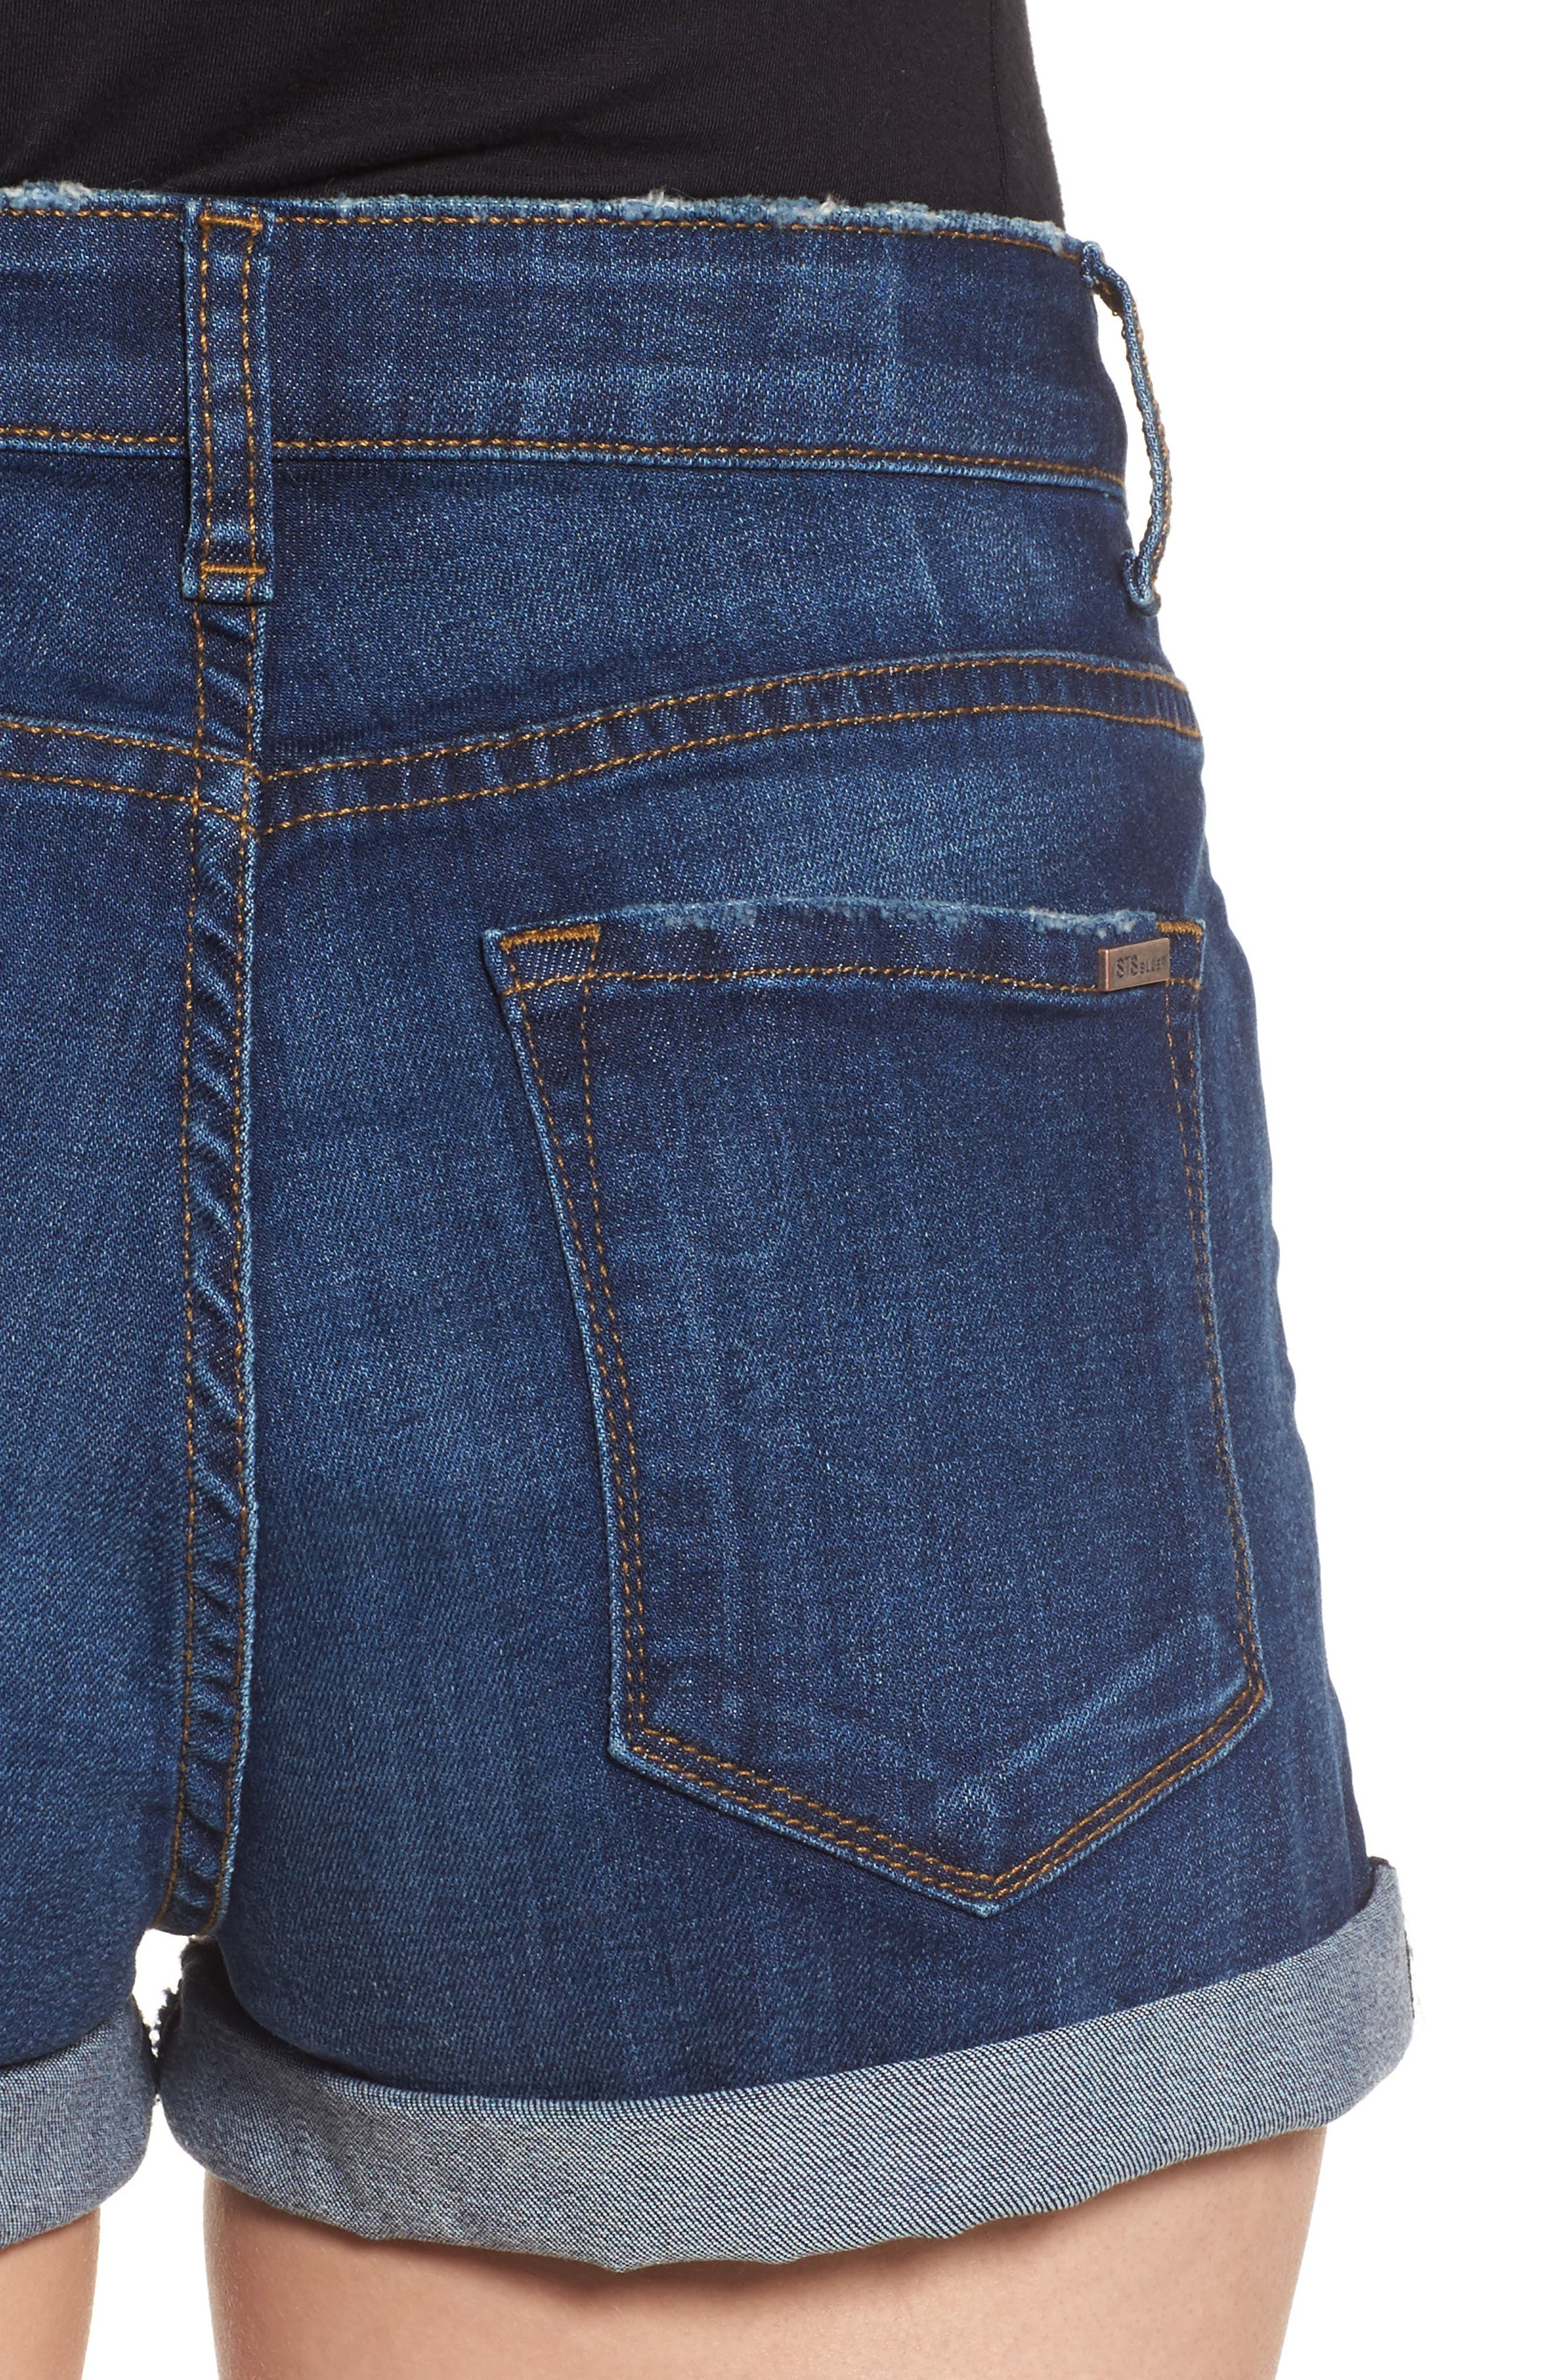 Rose Bowl Cuffed Denim Shorts,                             Alternate thumbnail 4, color,                             Sageland